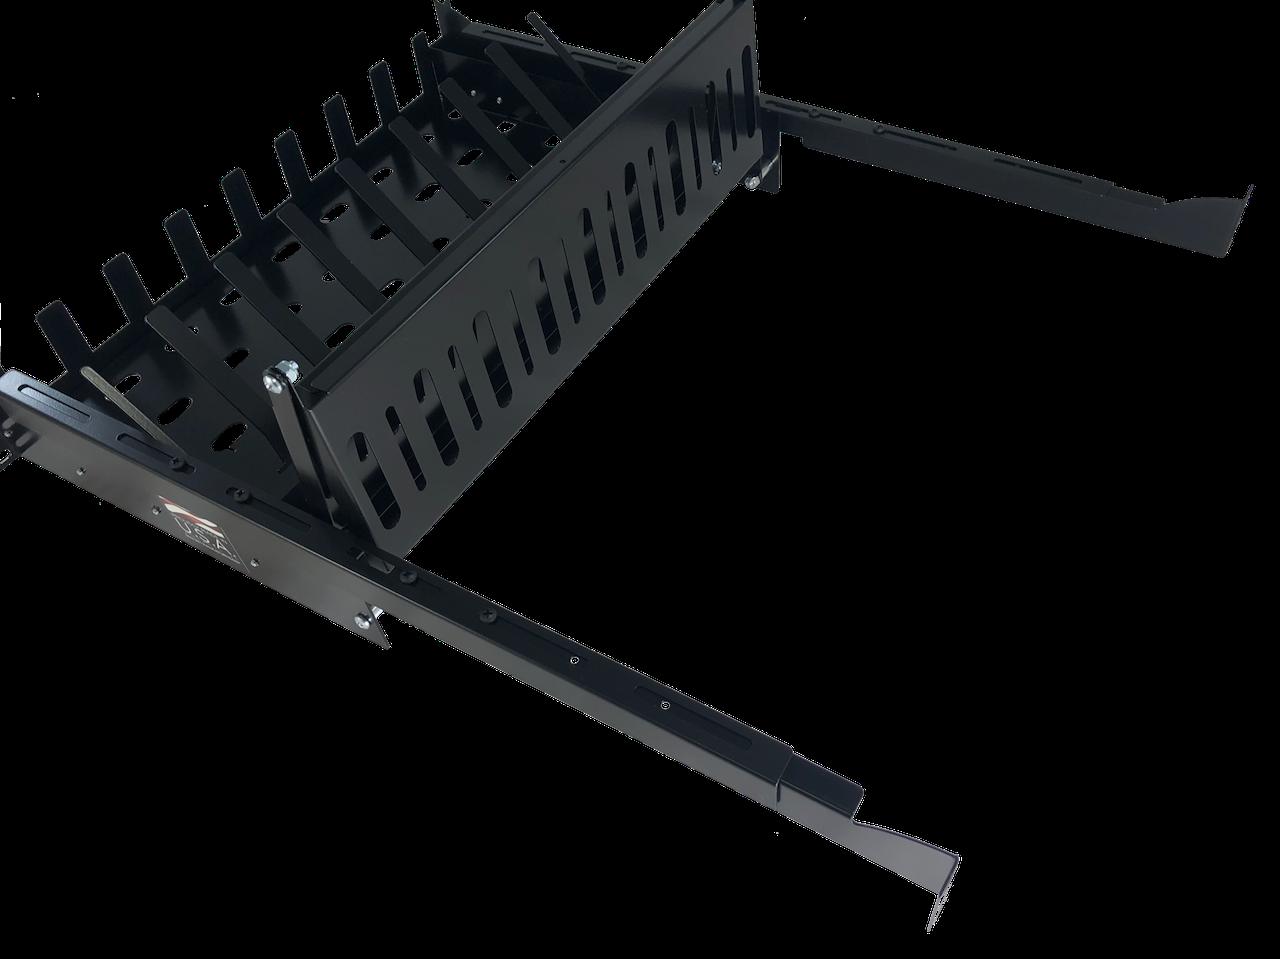 Rear brace kit shown on MMR-2G-5URS